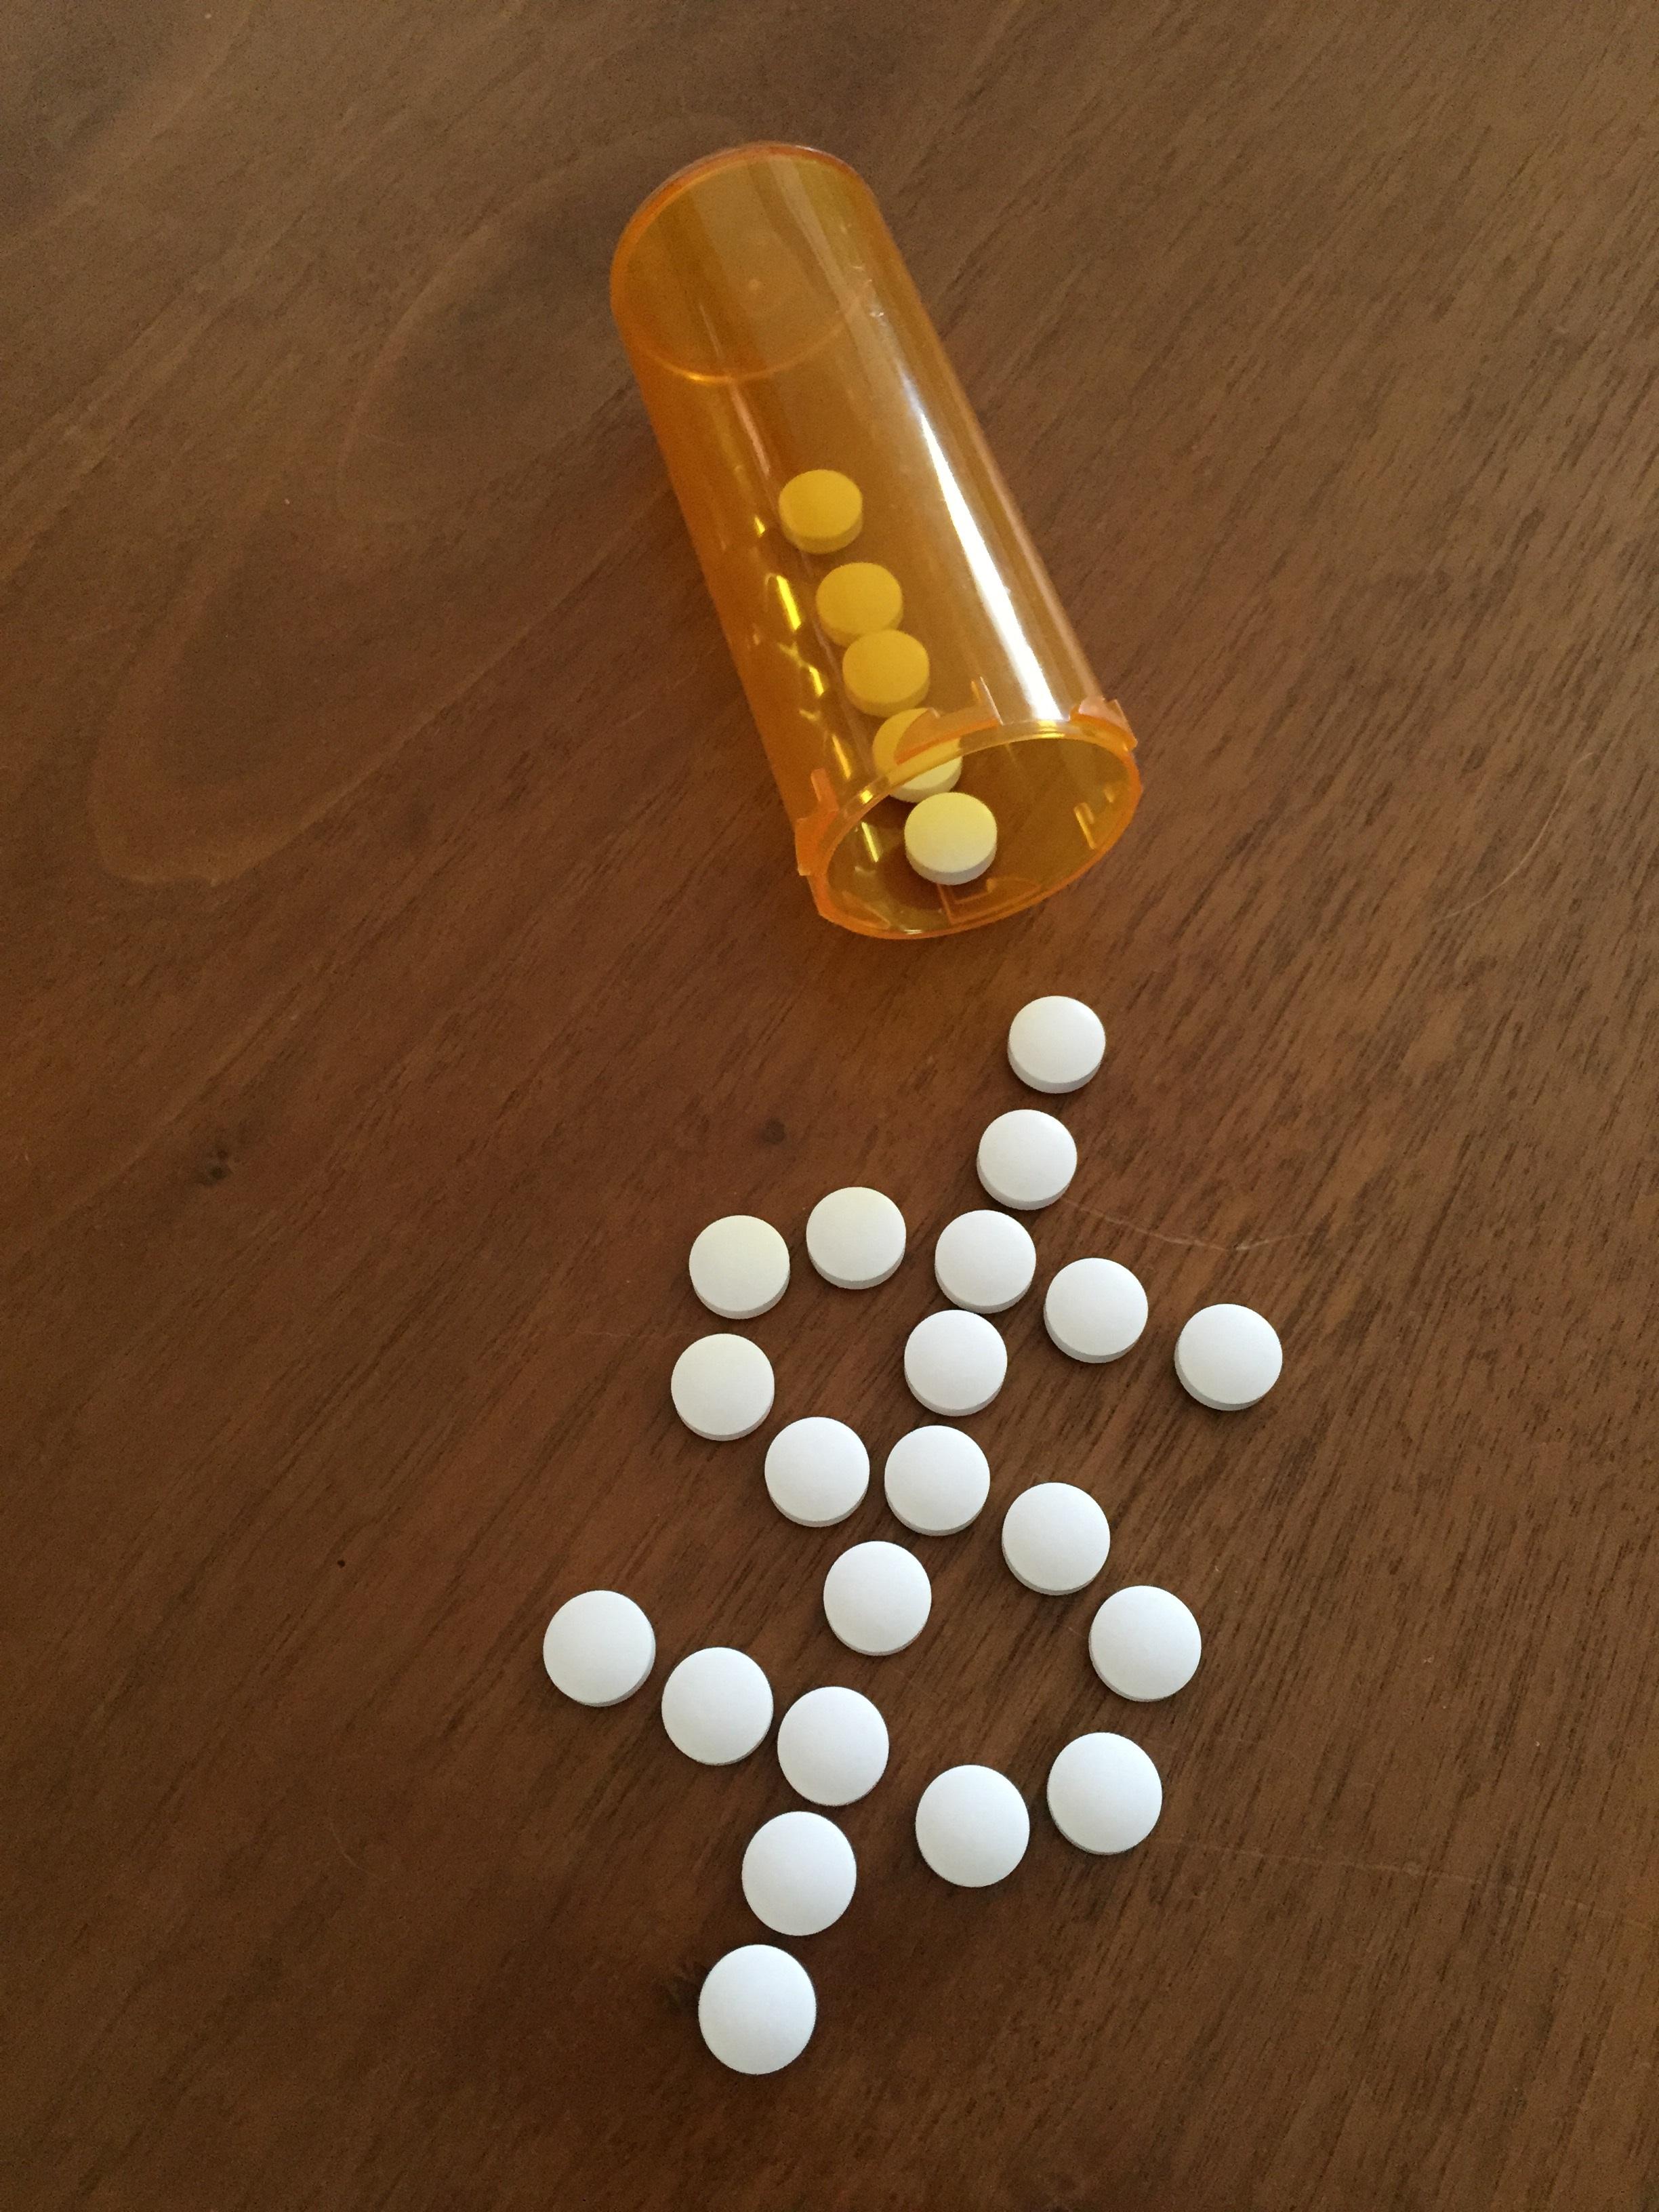 pills in dollar sign